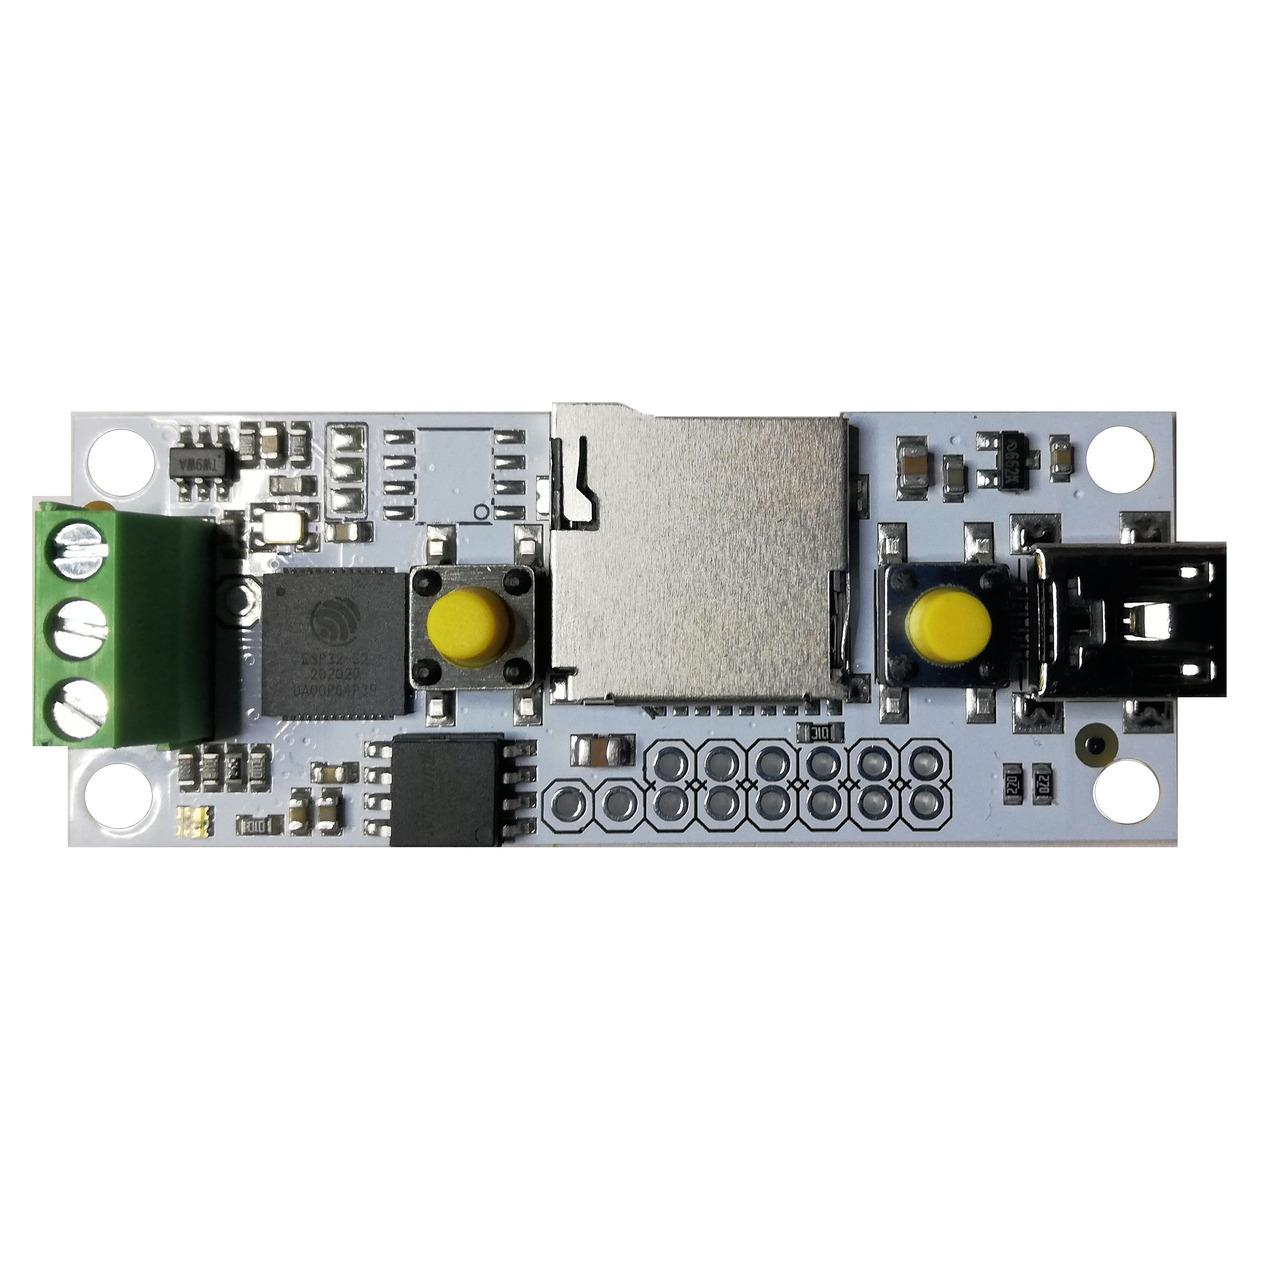 Diamex LED-Player fund-252 r WS2812-LEDs